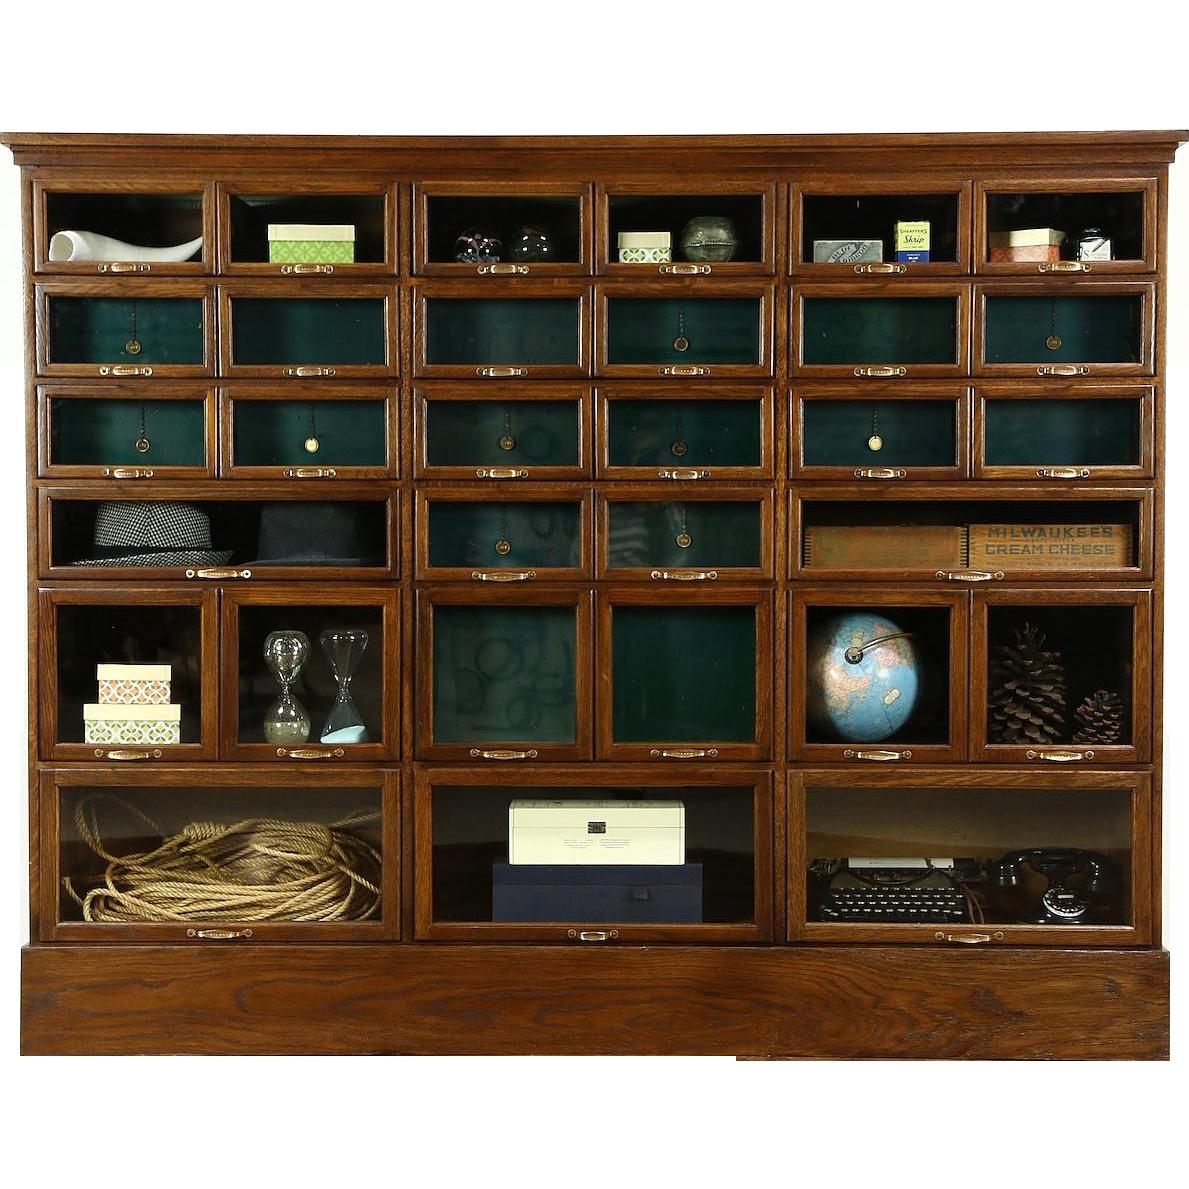 Warren Signed Oak Antique 1900 Store Display Cabinet, 32 Glass Front Drawers - Warren Signed Oak Antique 1900 Store Display Cabinet, 32 Glass